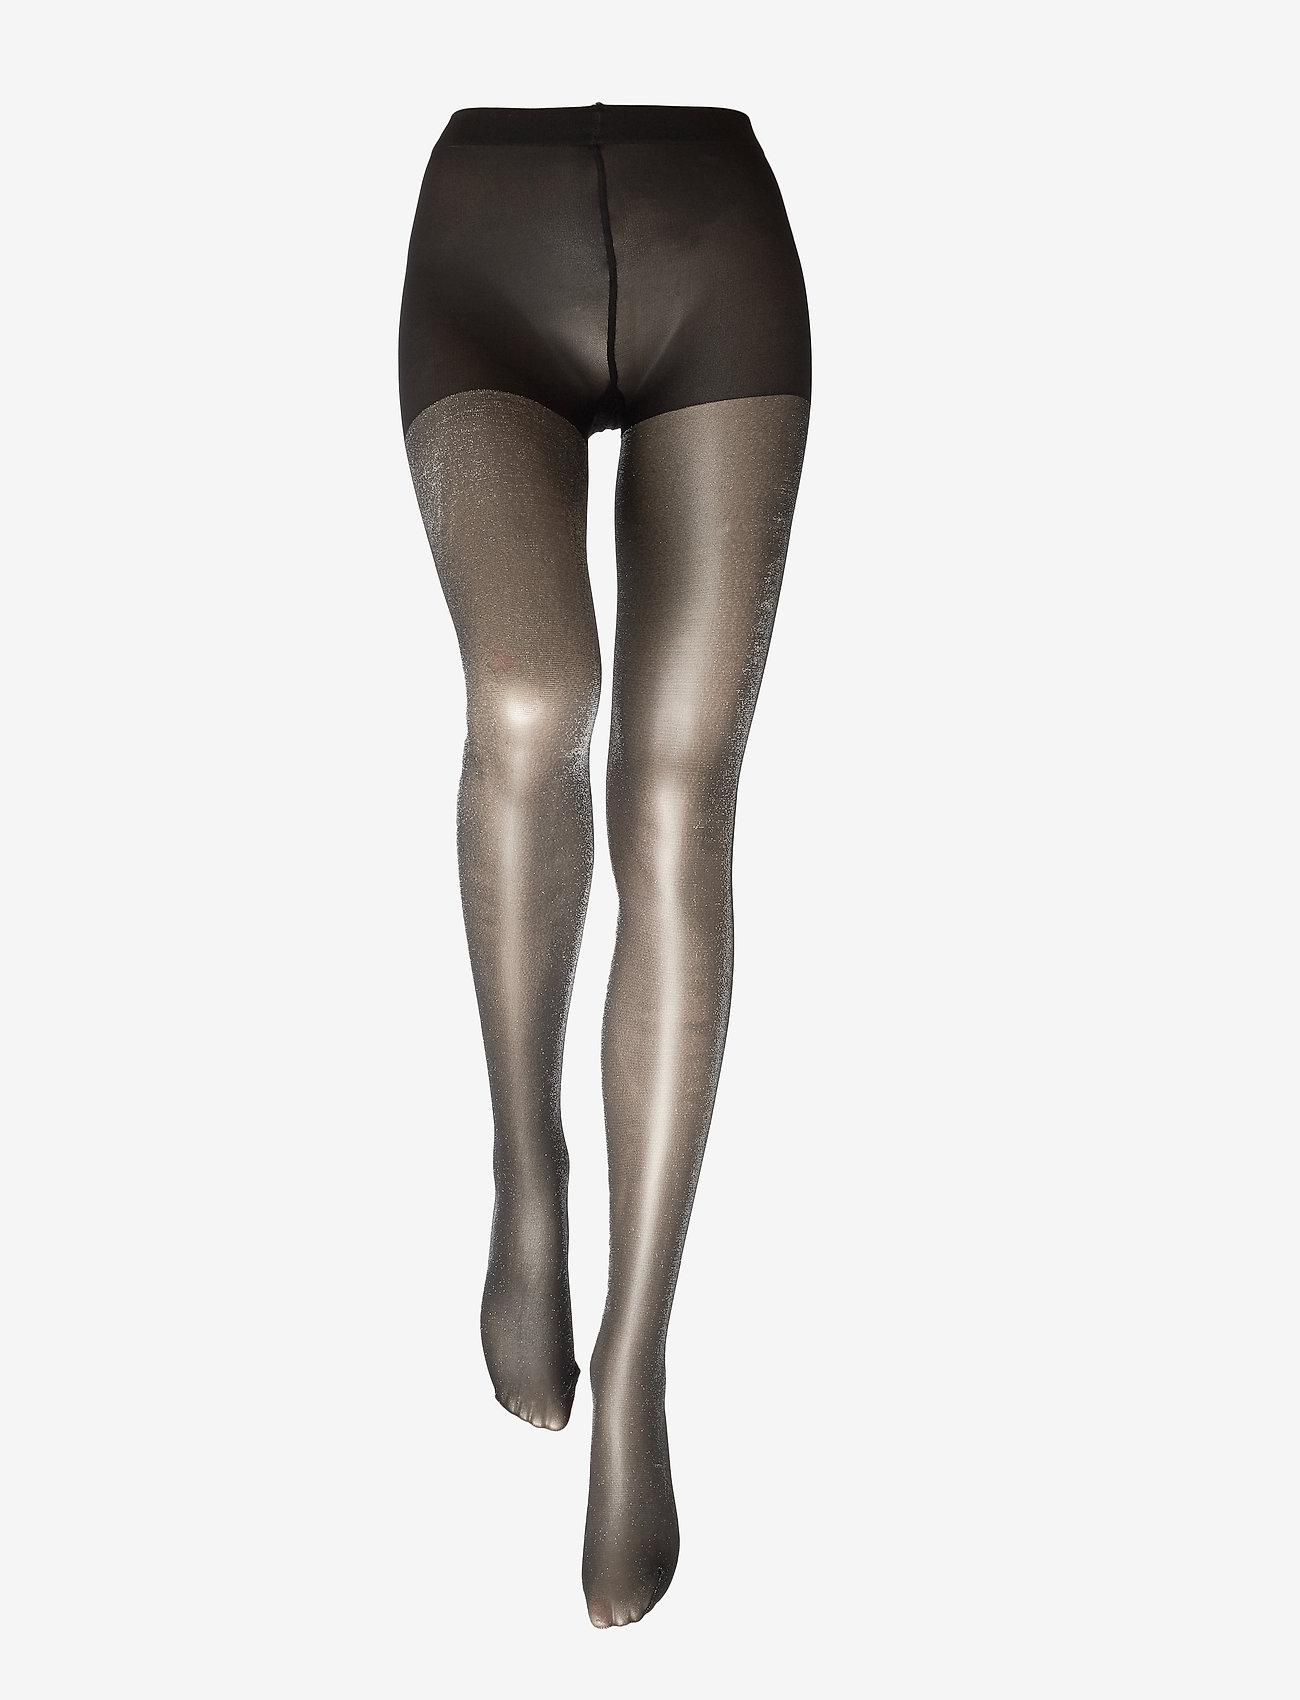 Vogue - Ladies pantyhose den, Roseline 40 - panty's - black - 1